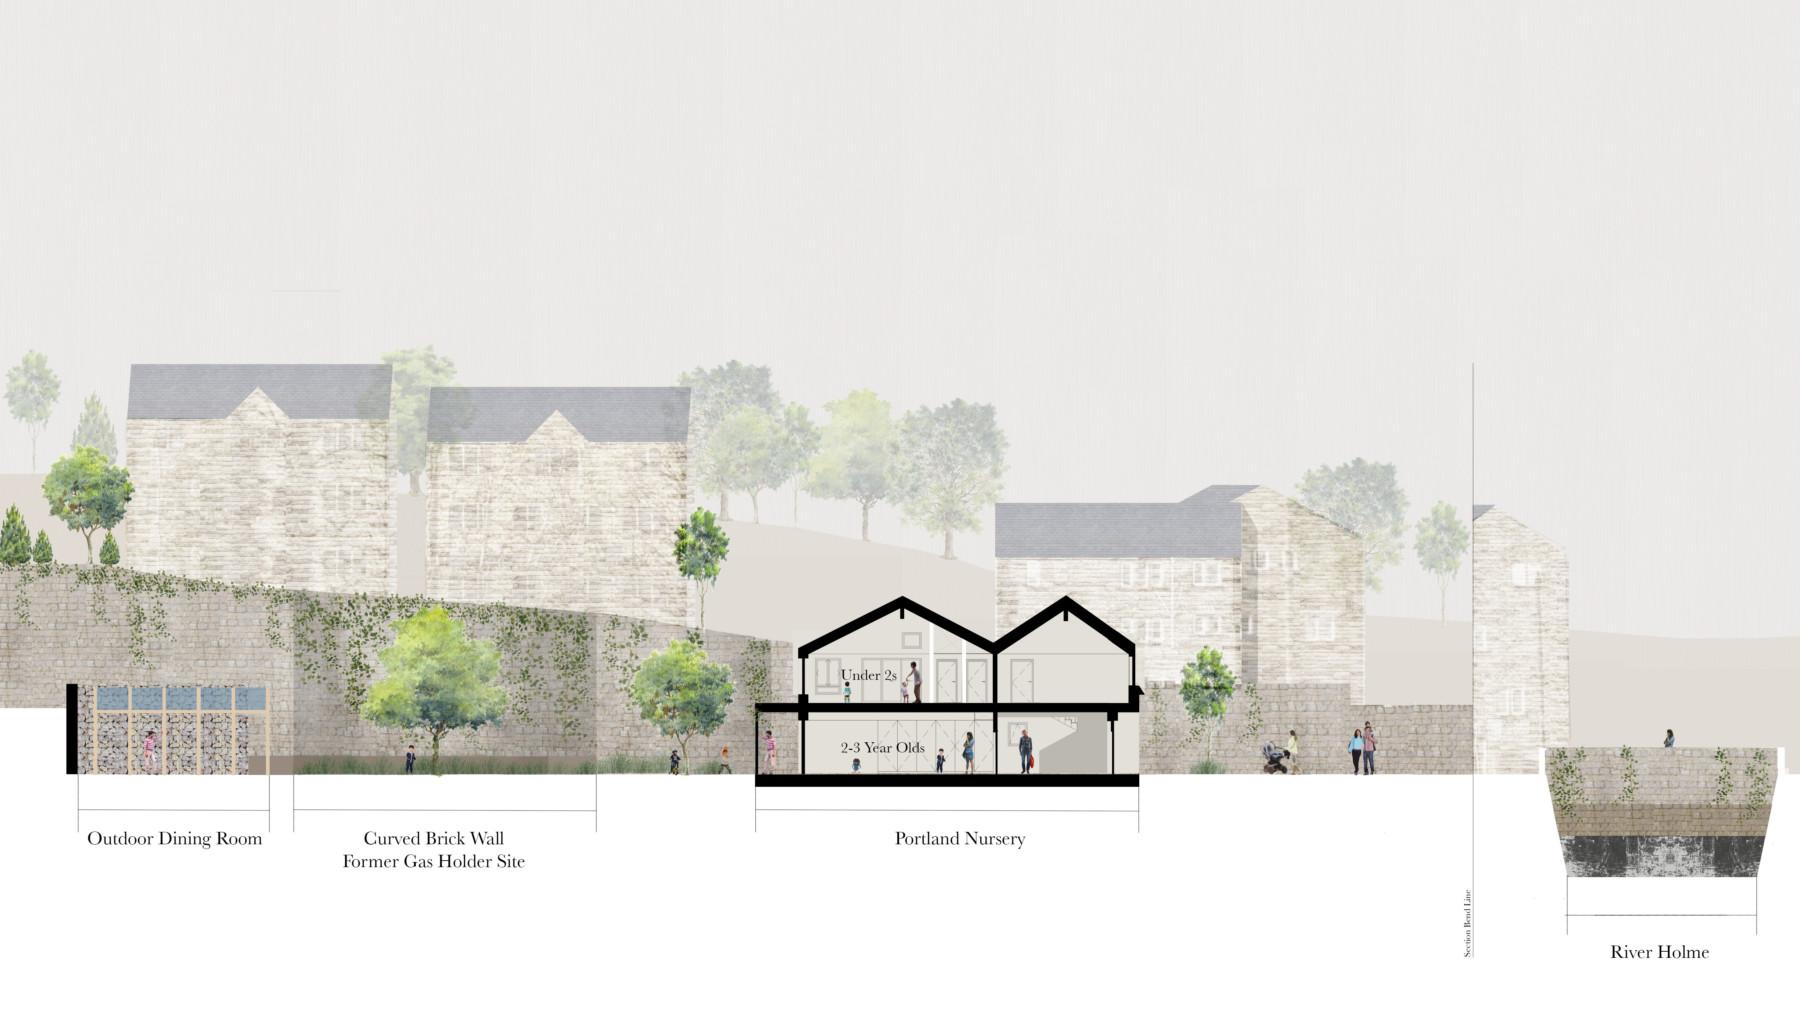 Sarah-Wigglesworth-Architects Portland-Nursery Section 3600